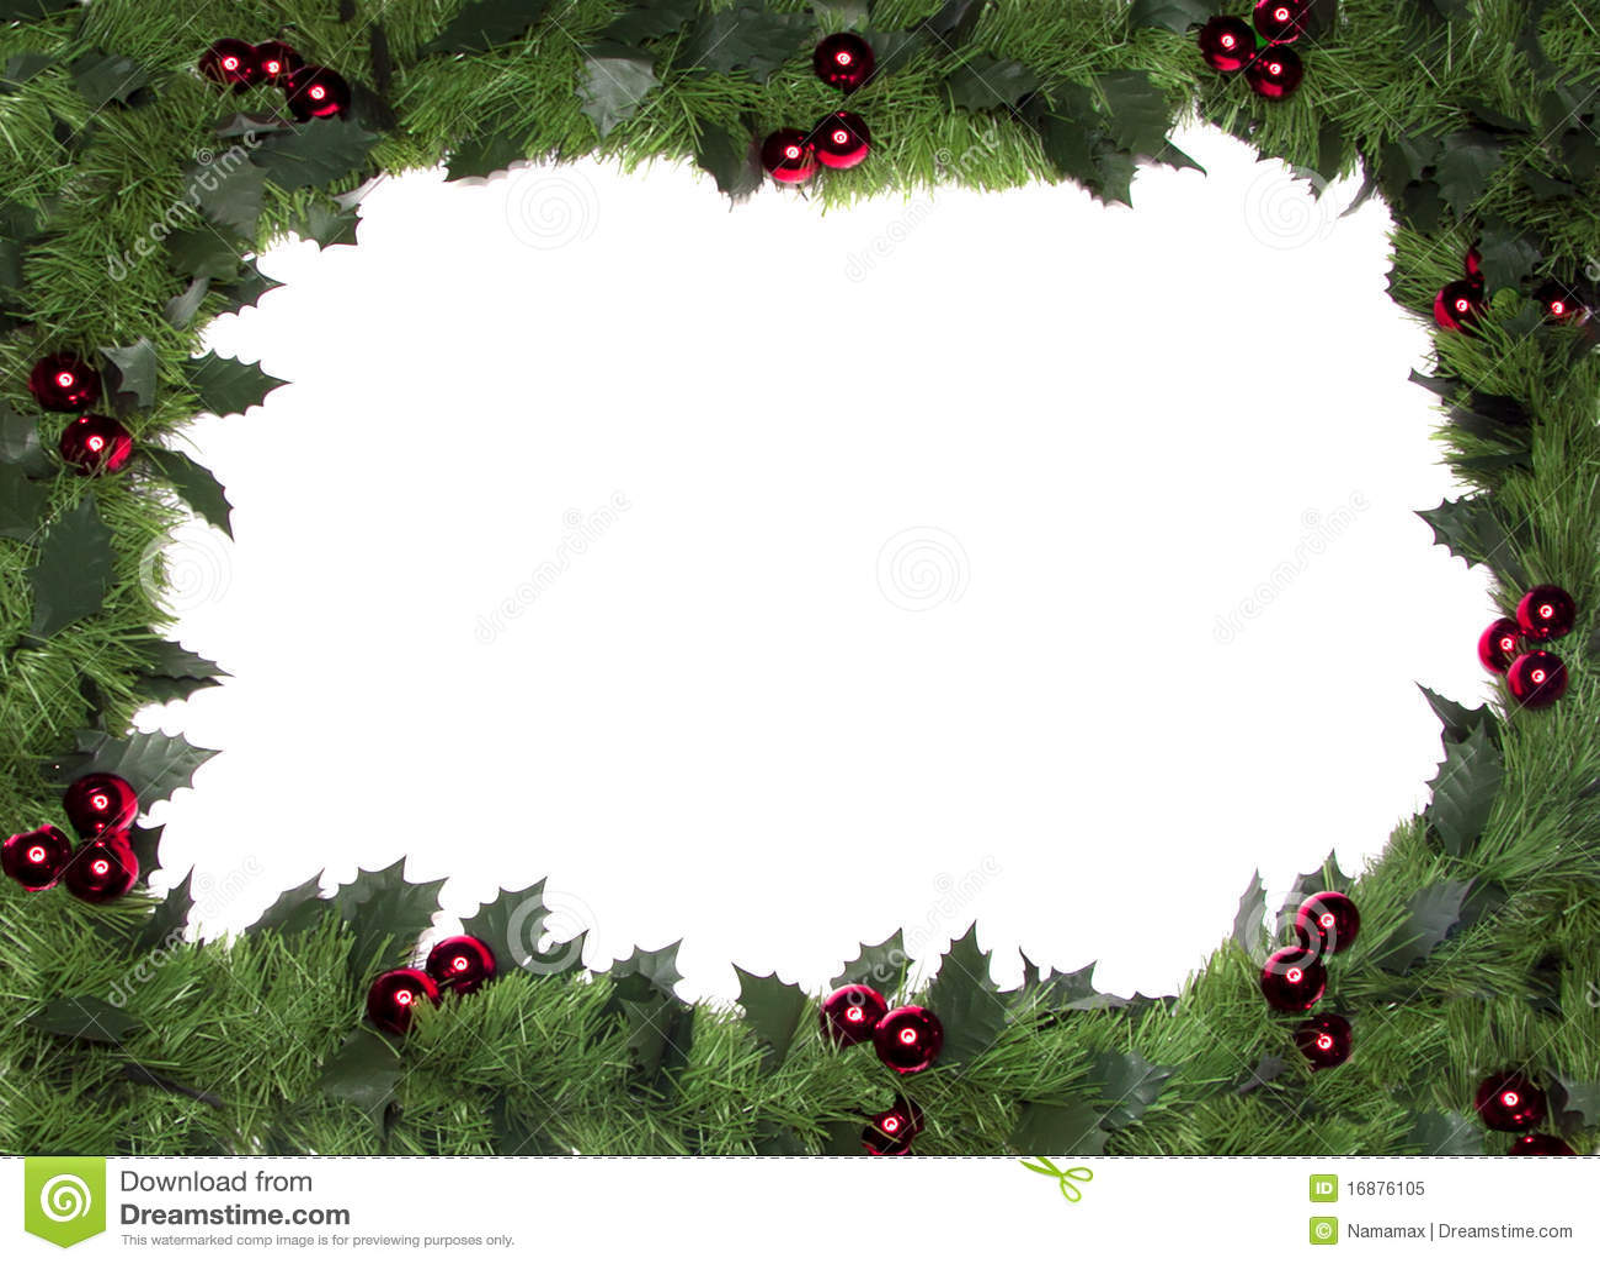 Christmas frame, border